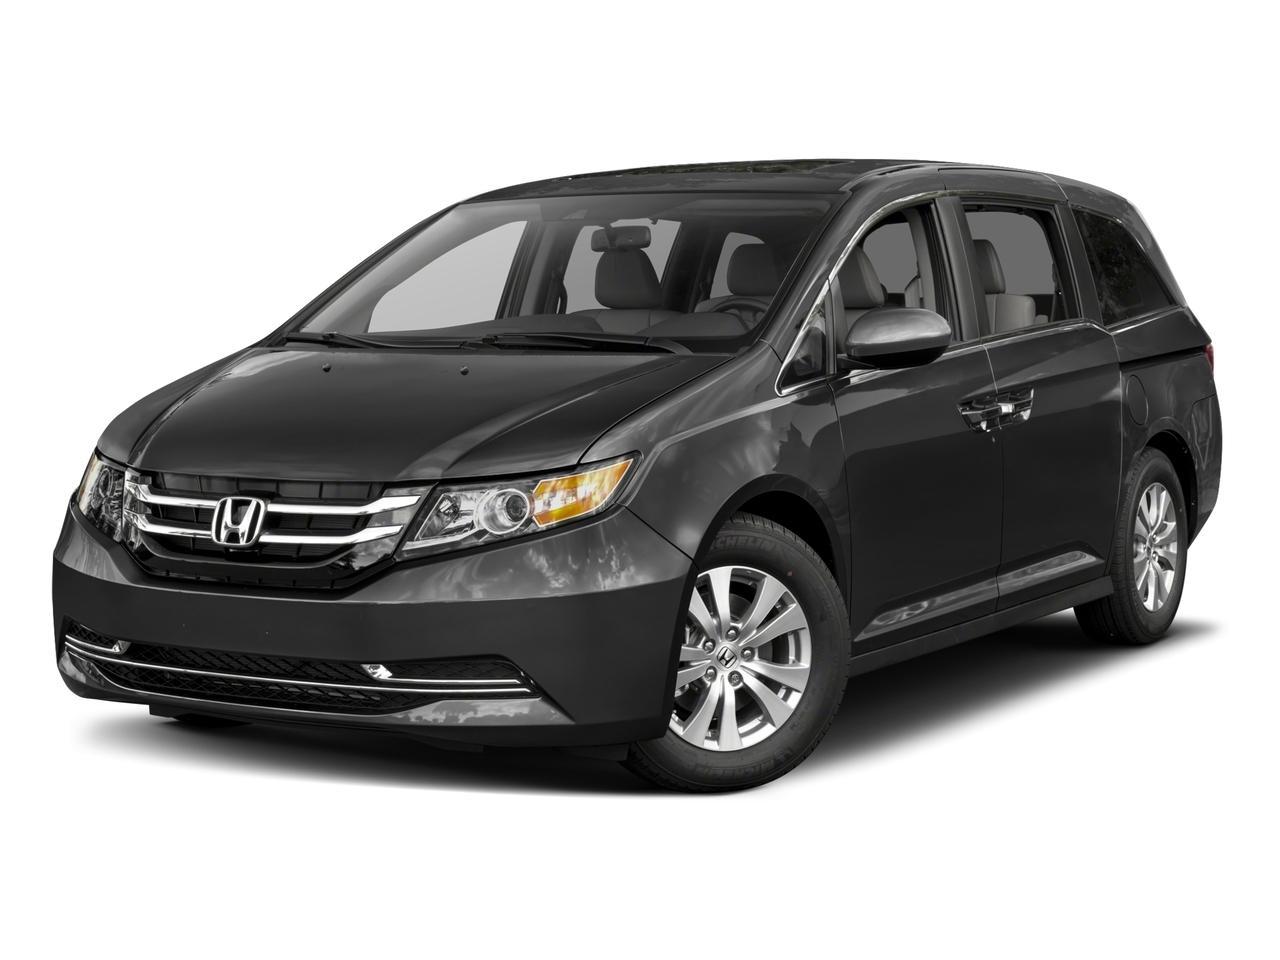 2017 Honda Odyssey Vehicle Photo in Owensboro, KY 42303